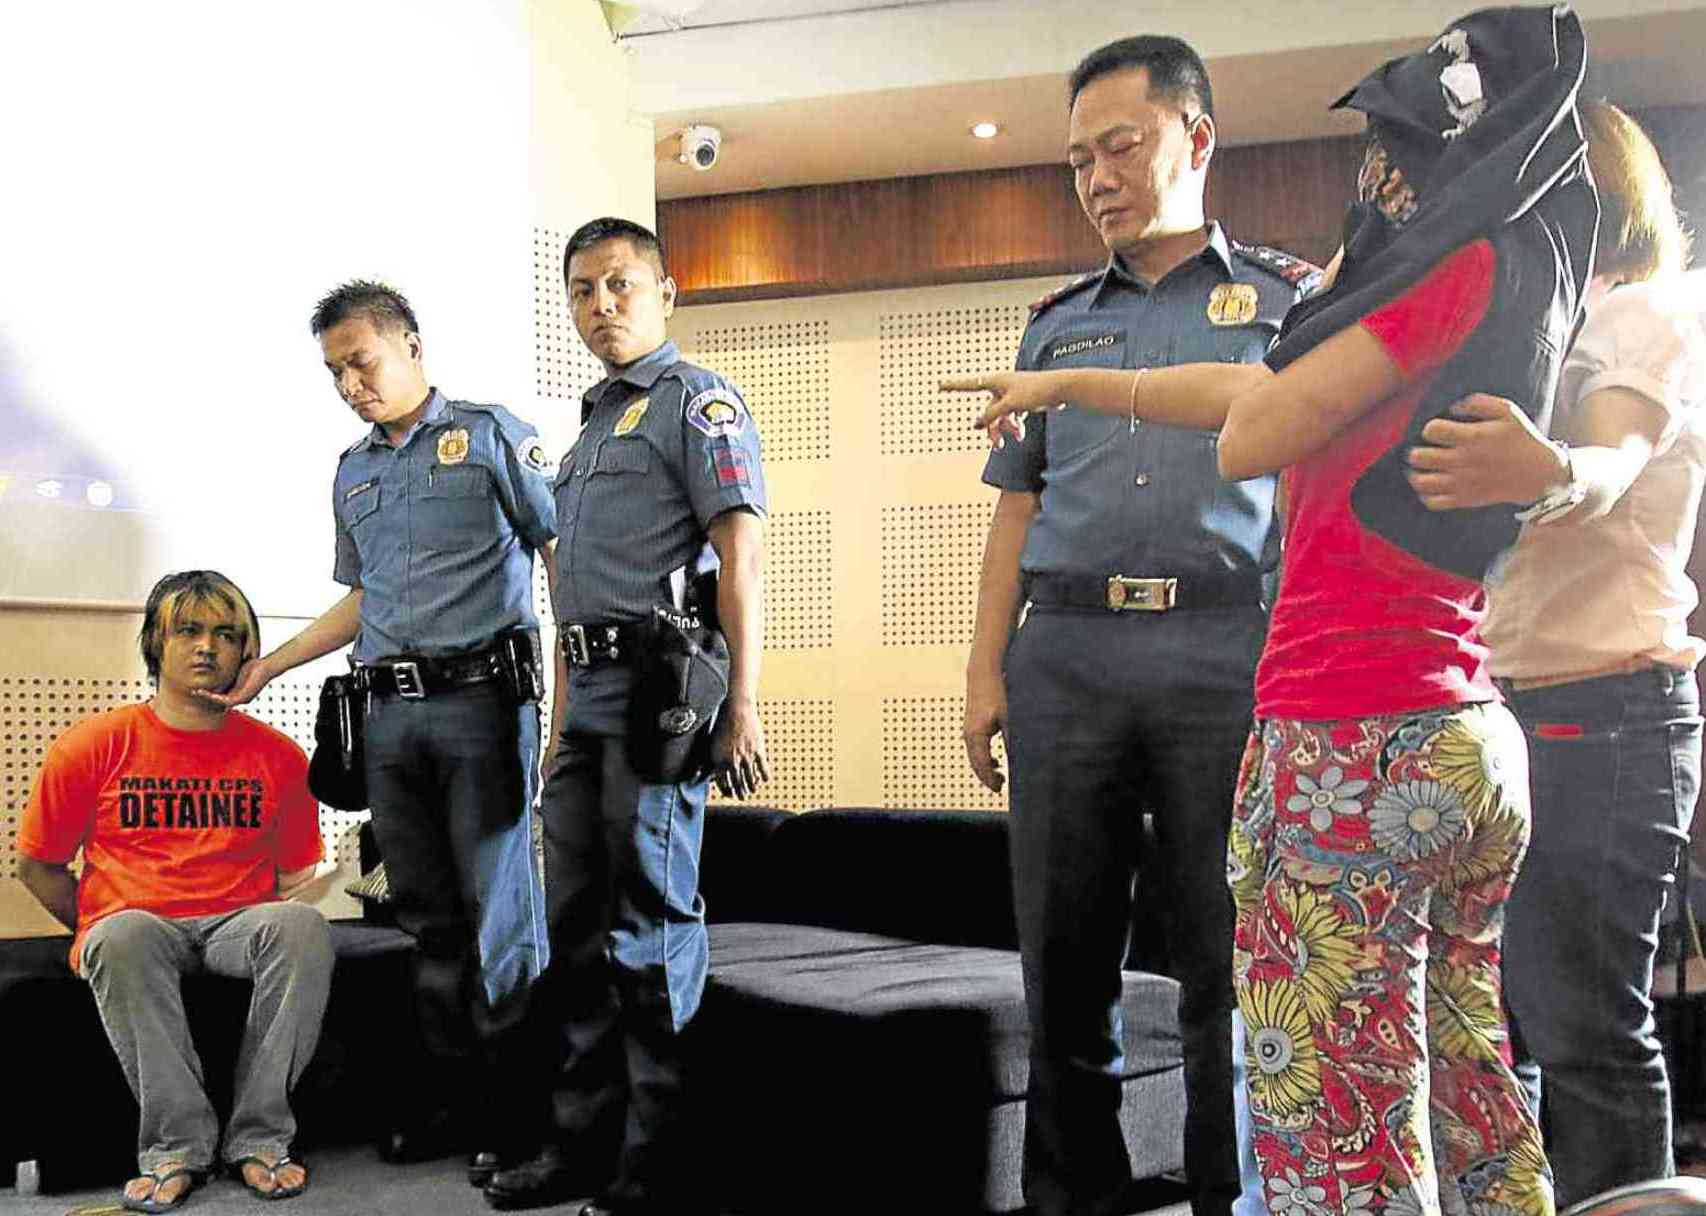 http://quezoncity.com/000001a/000001b/qc+links/suspect/taxi+rape+philippines+nitro+ison+02.jpg